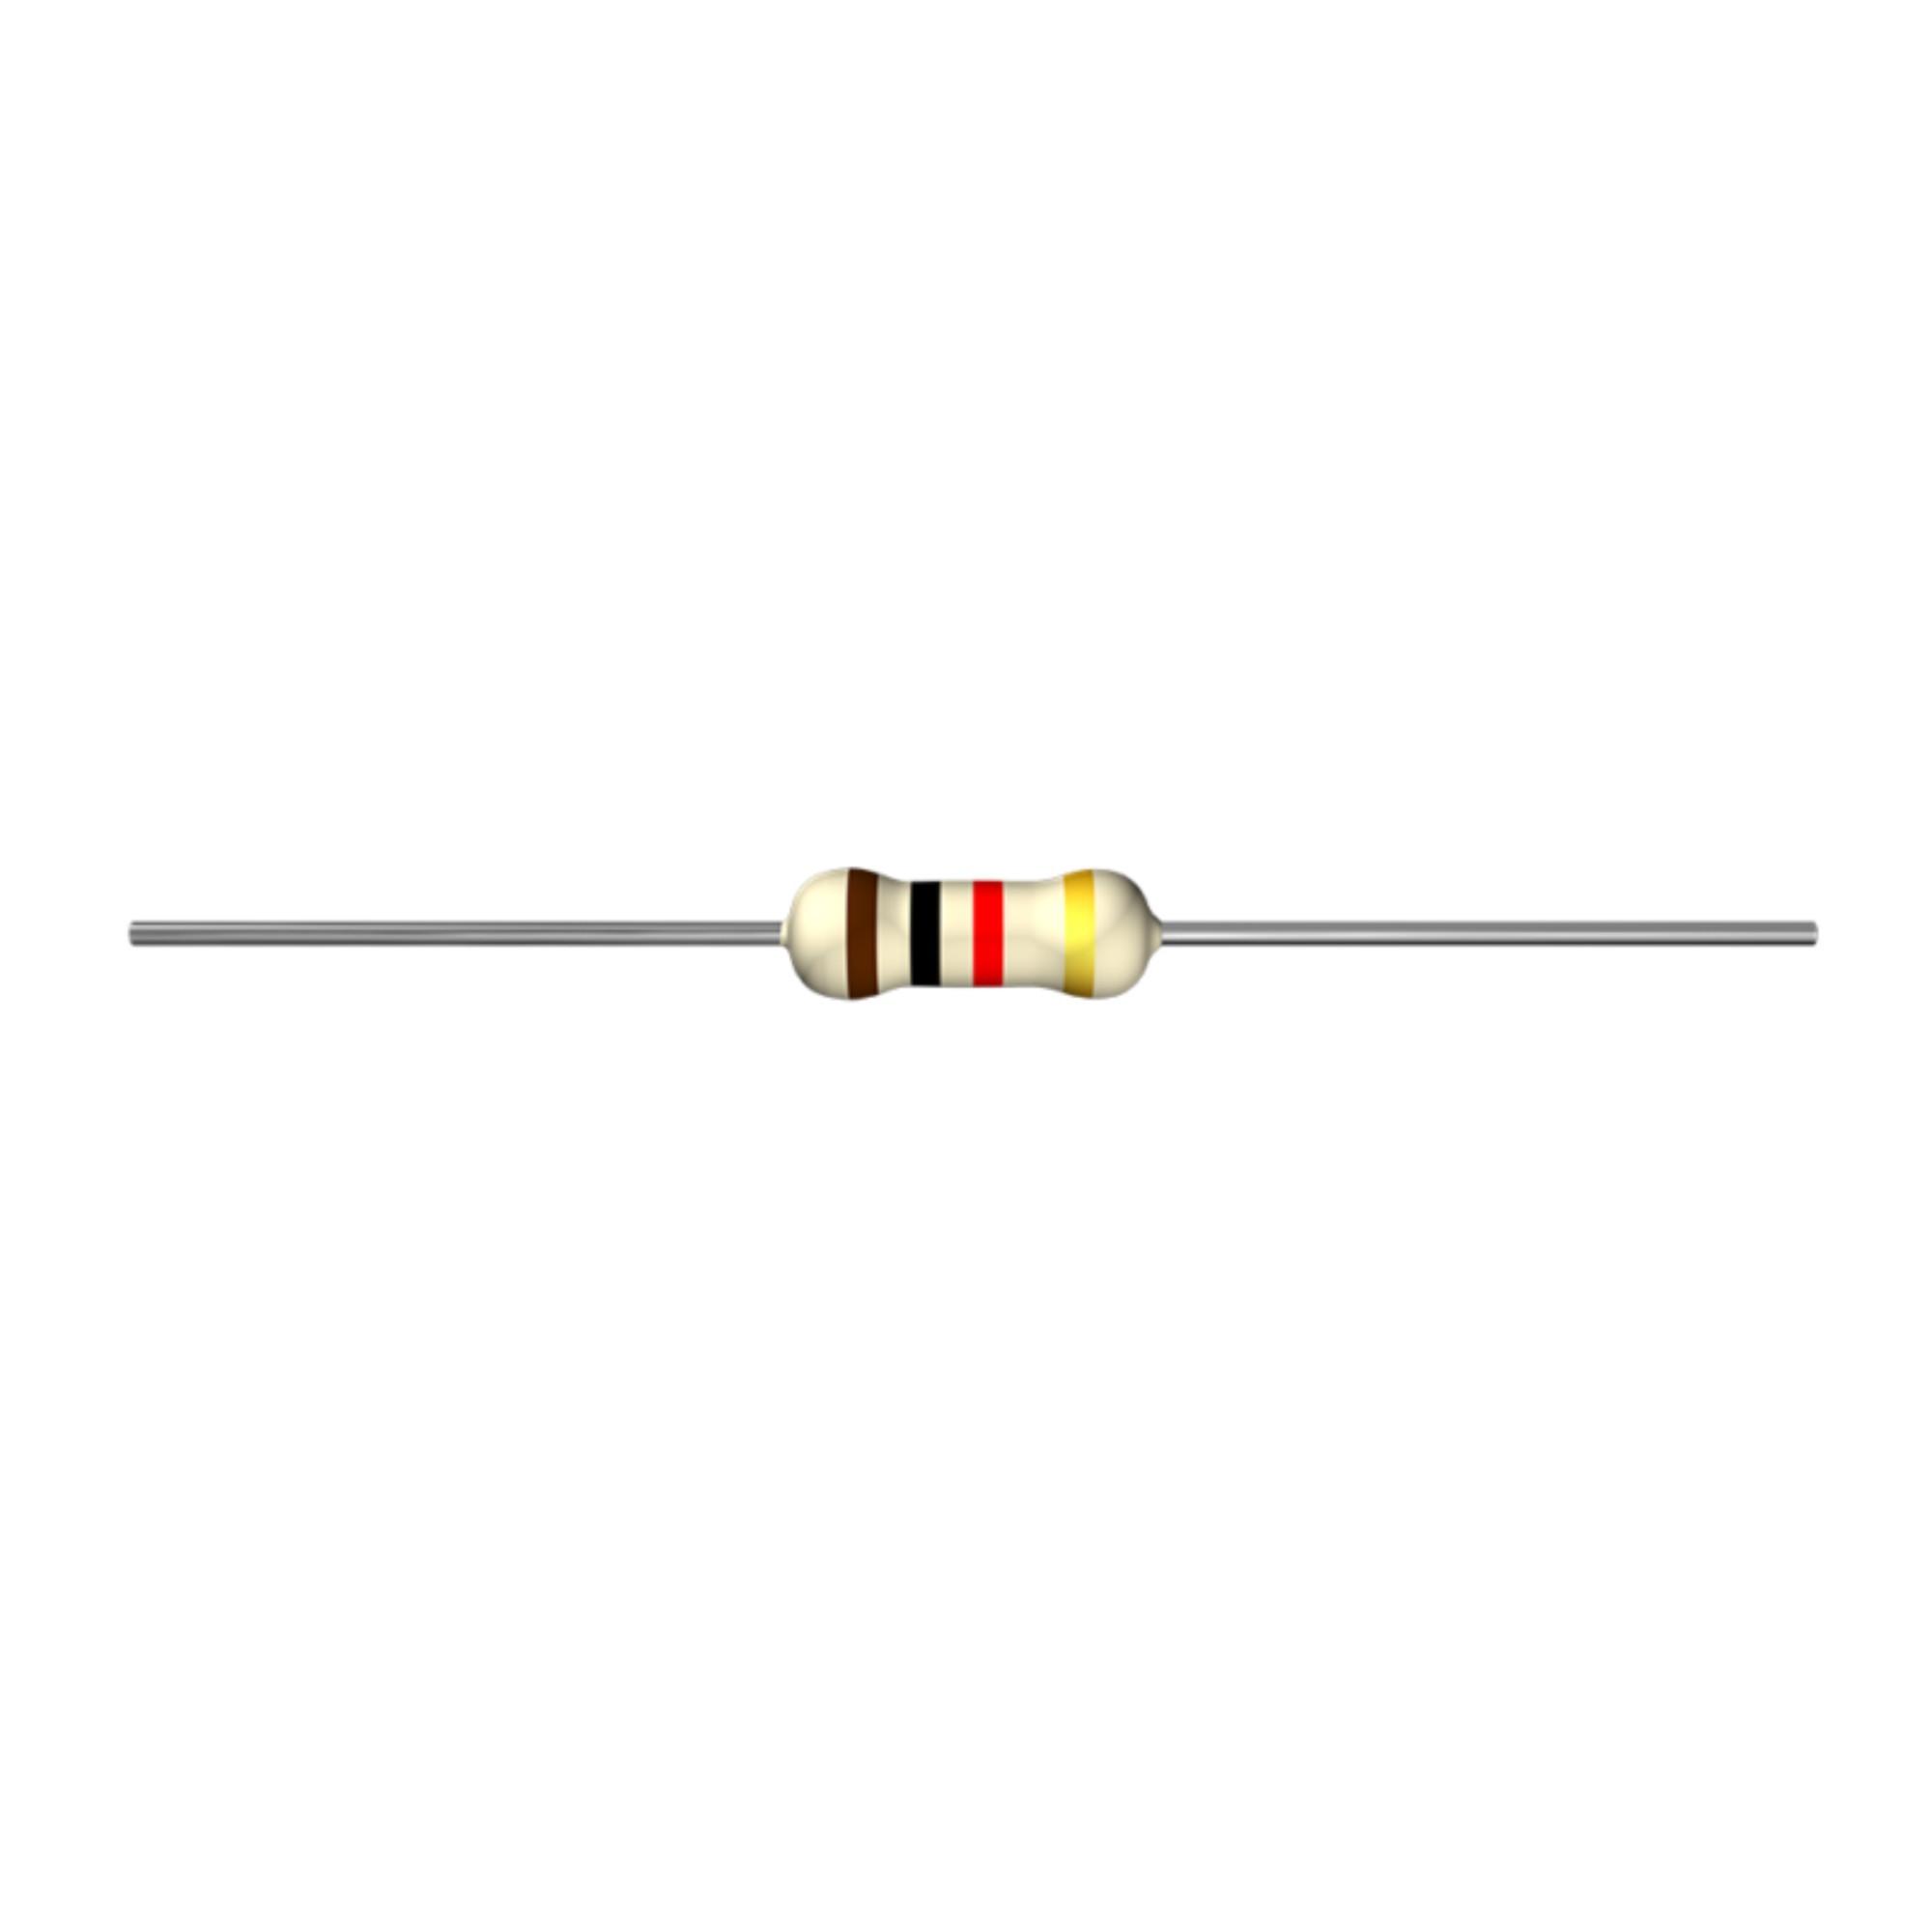 Resistor 2k CR25 1/4W 5% C/ 10 Unidades